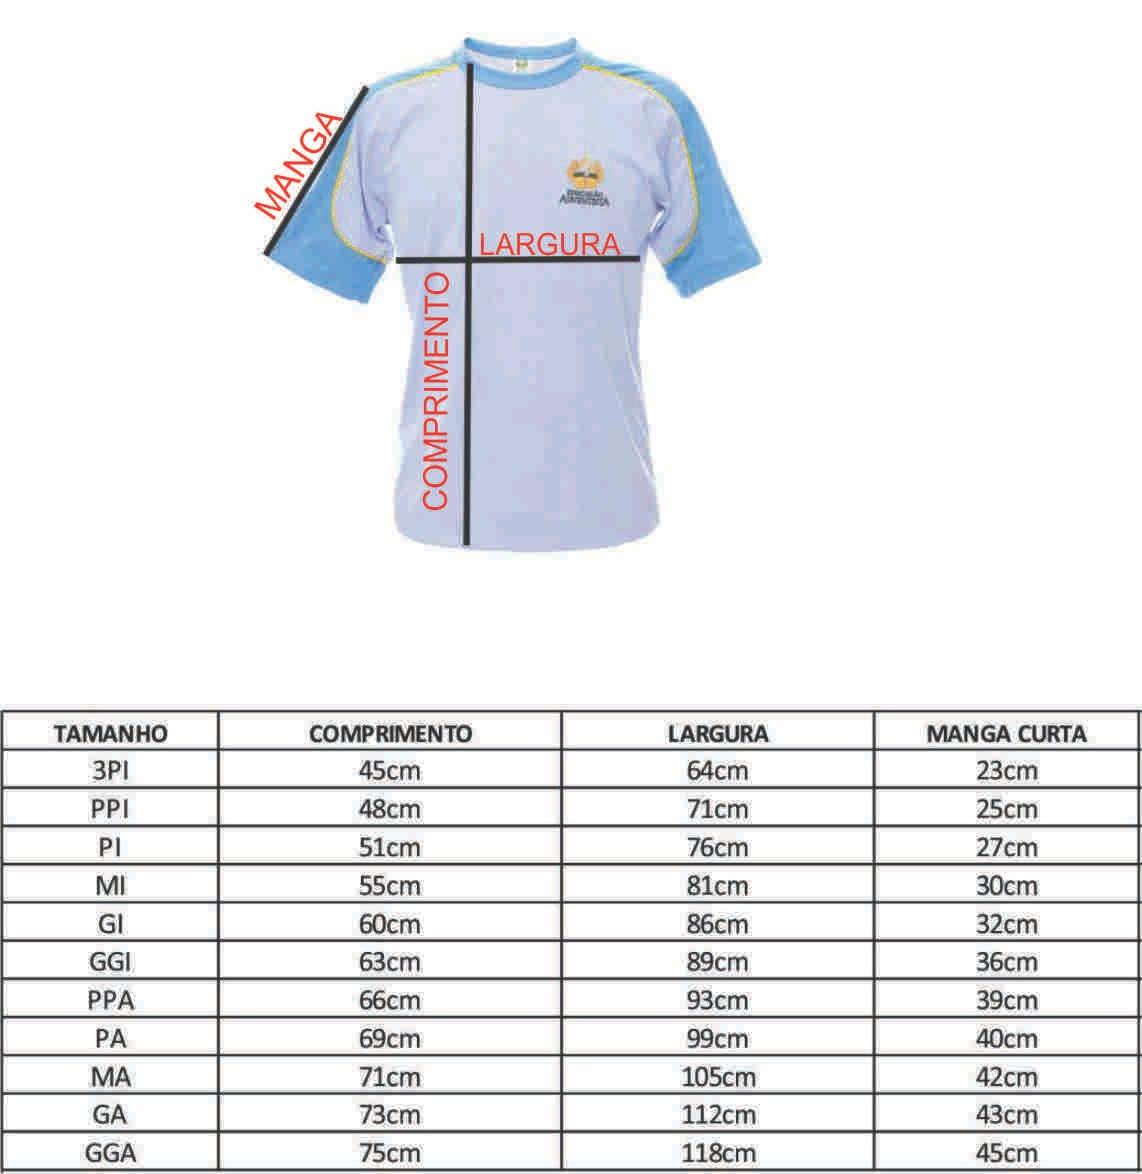 Camiseta Manga Curta - PA ( 40-44 )